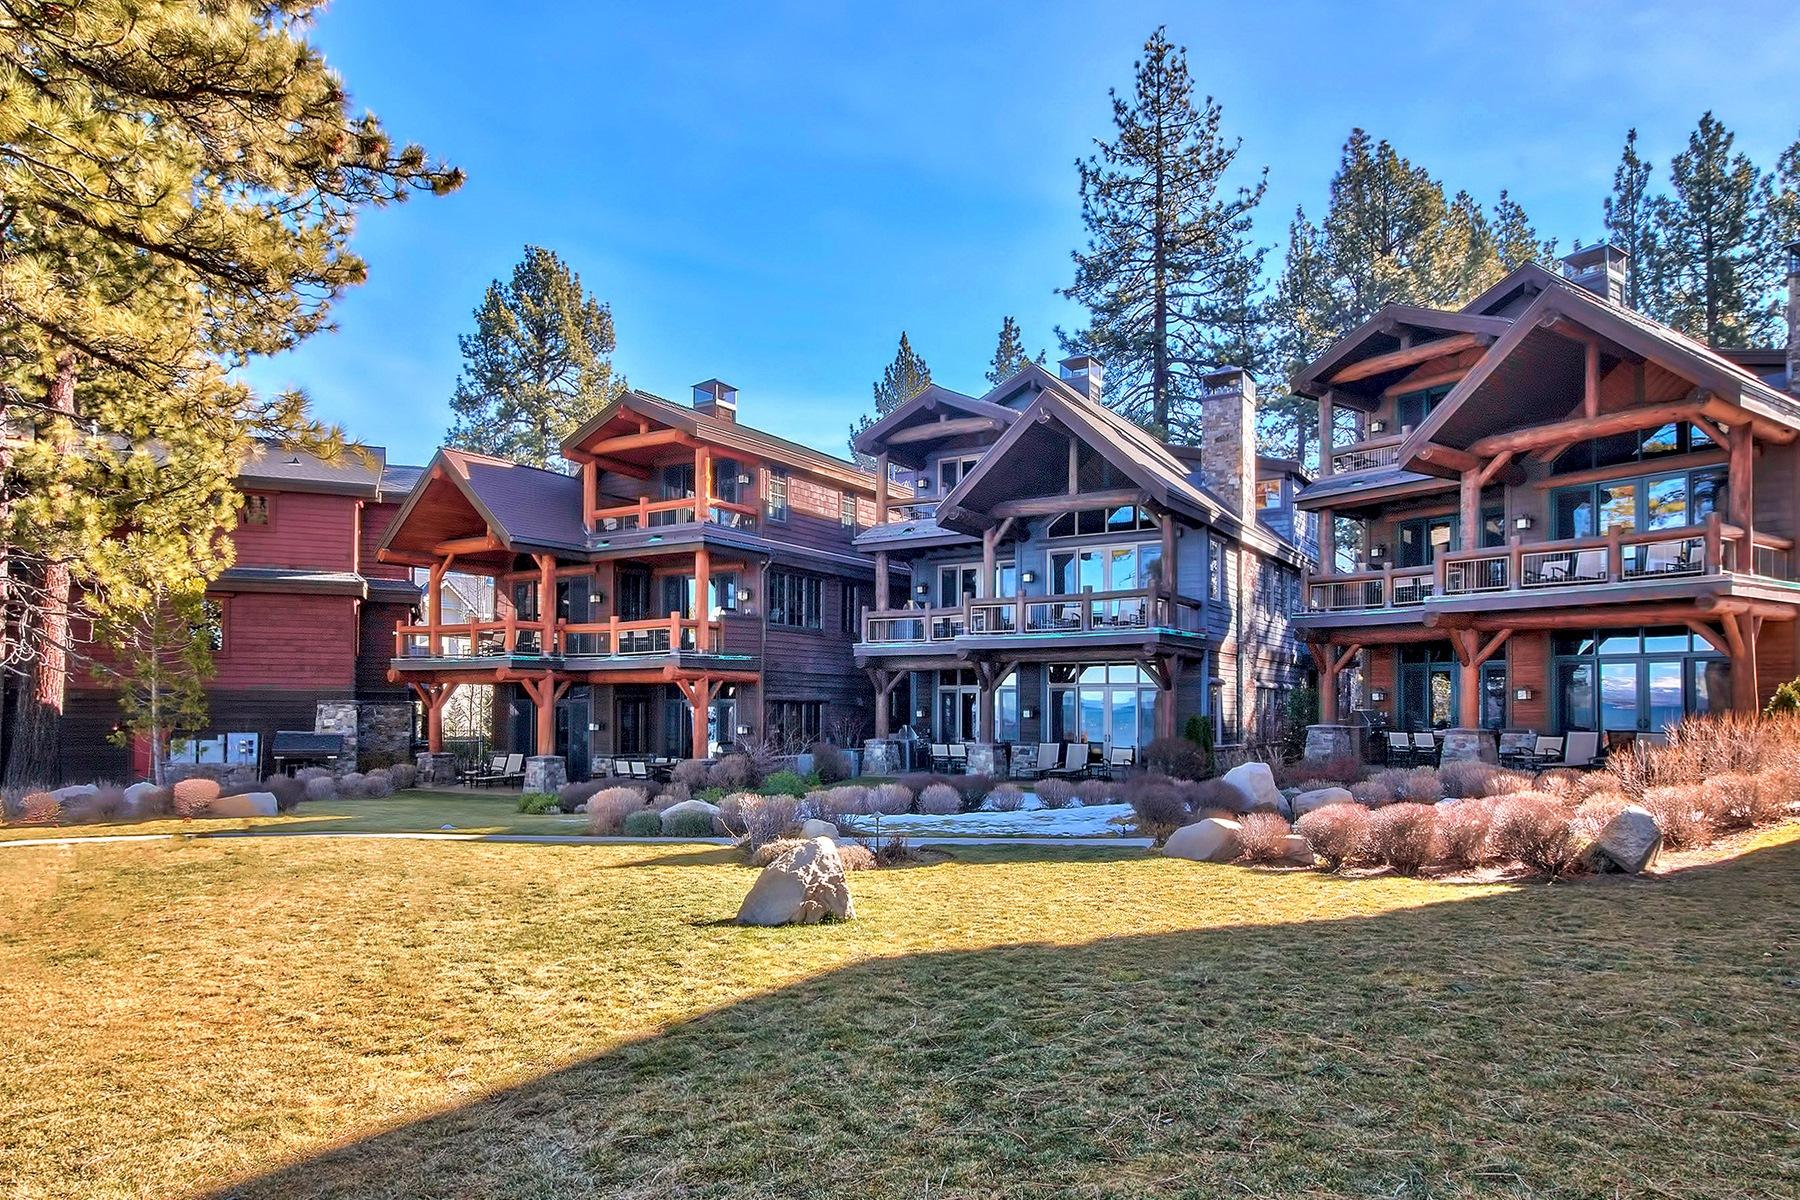 شقة بعمارة للـ Sale في 3371 Lake Tahoe Boulevard, Residence 11 3371 Lake Tahoe Boulevard Residence 11 South Lake Tahoe, California 96150 United States